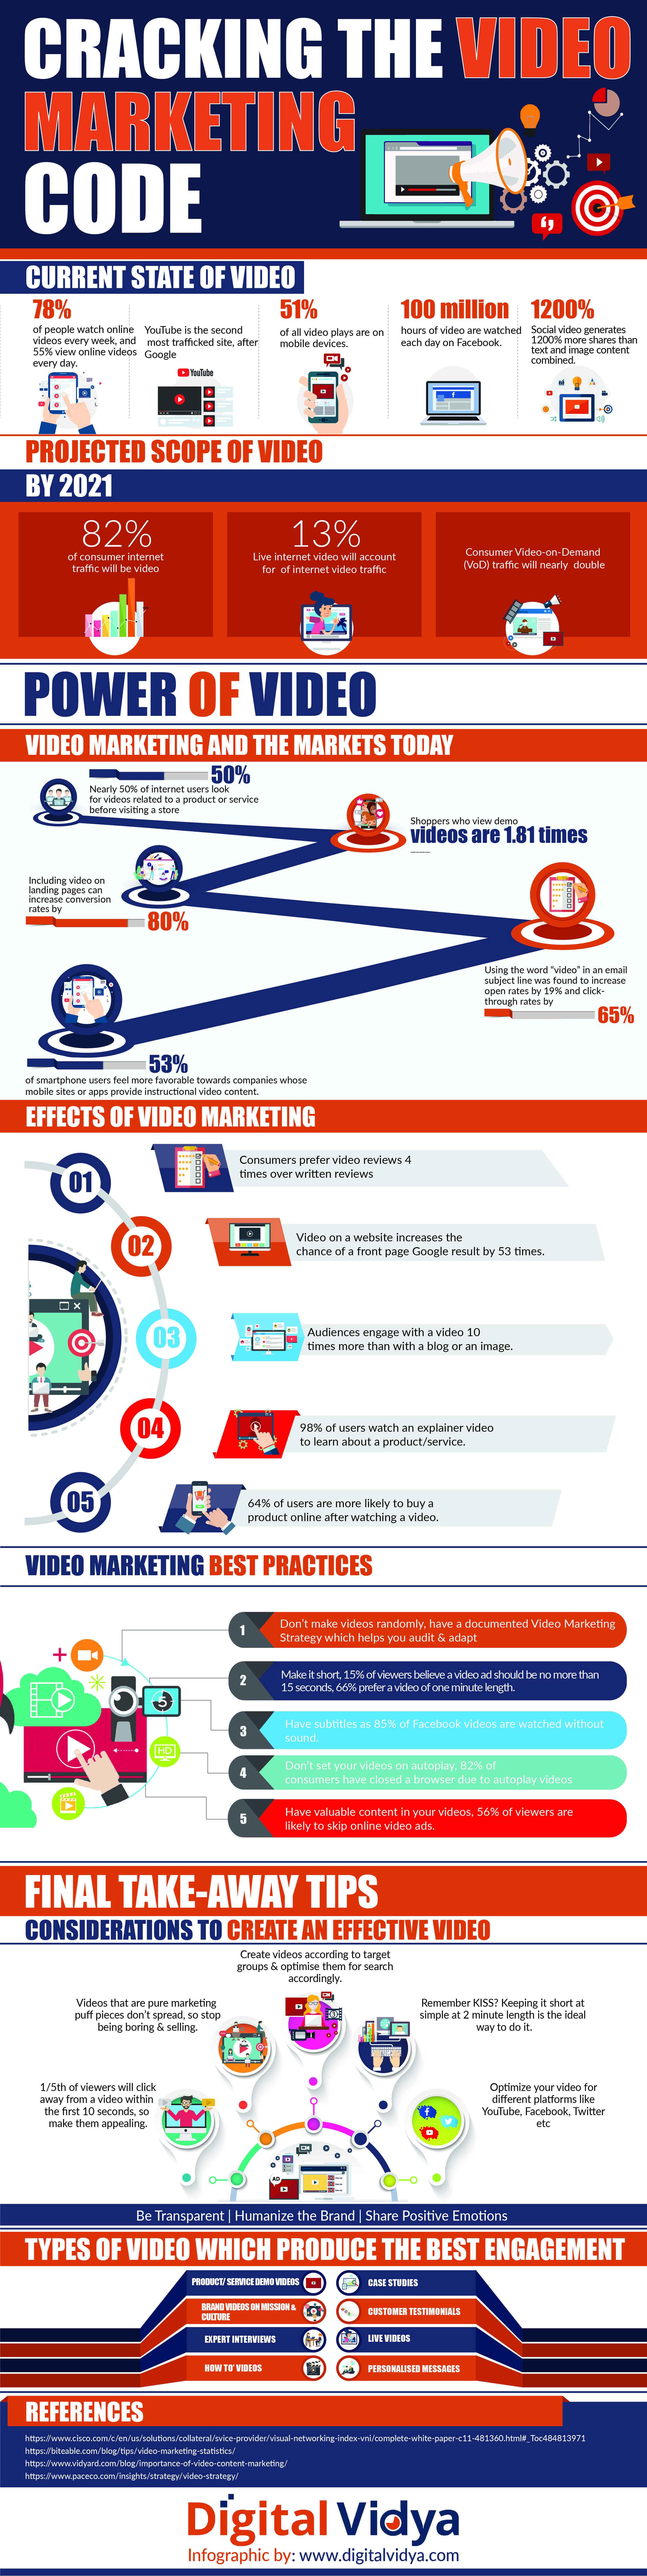 video marketing code